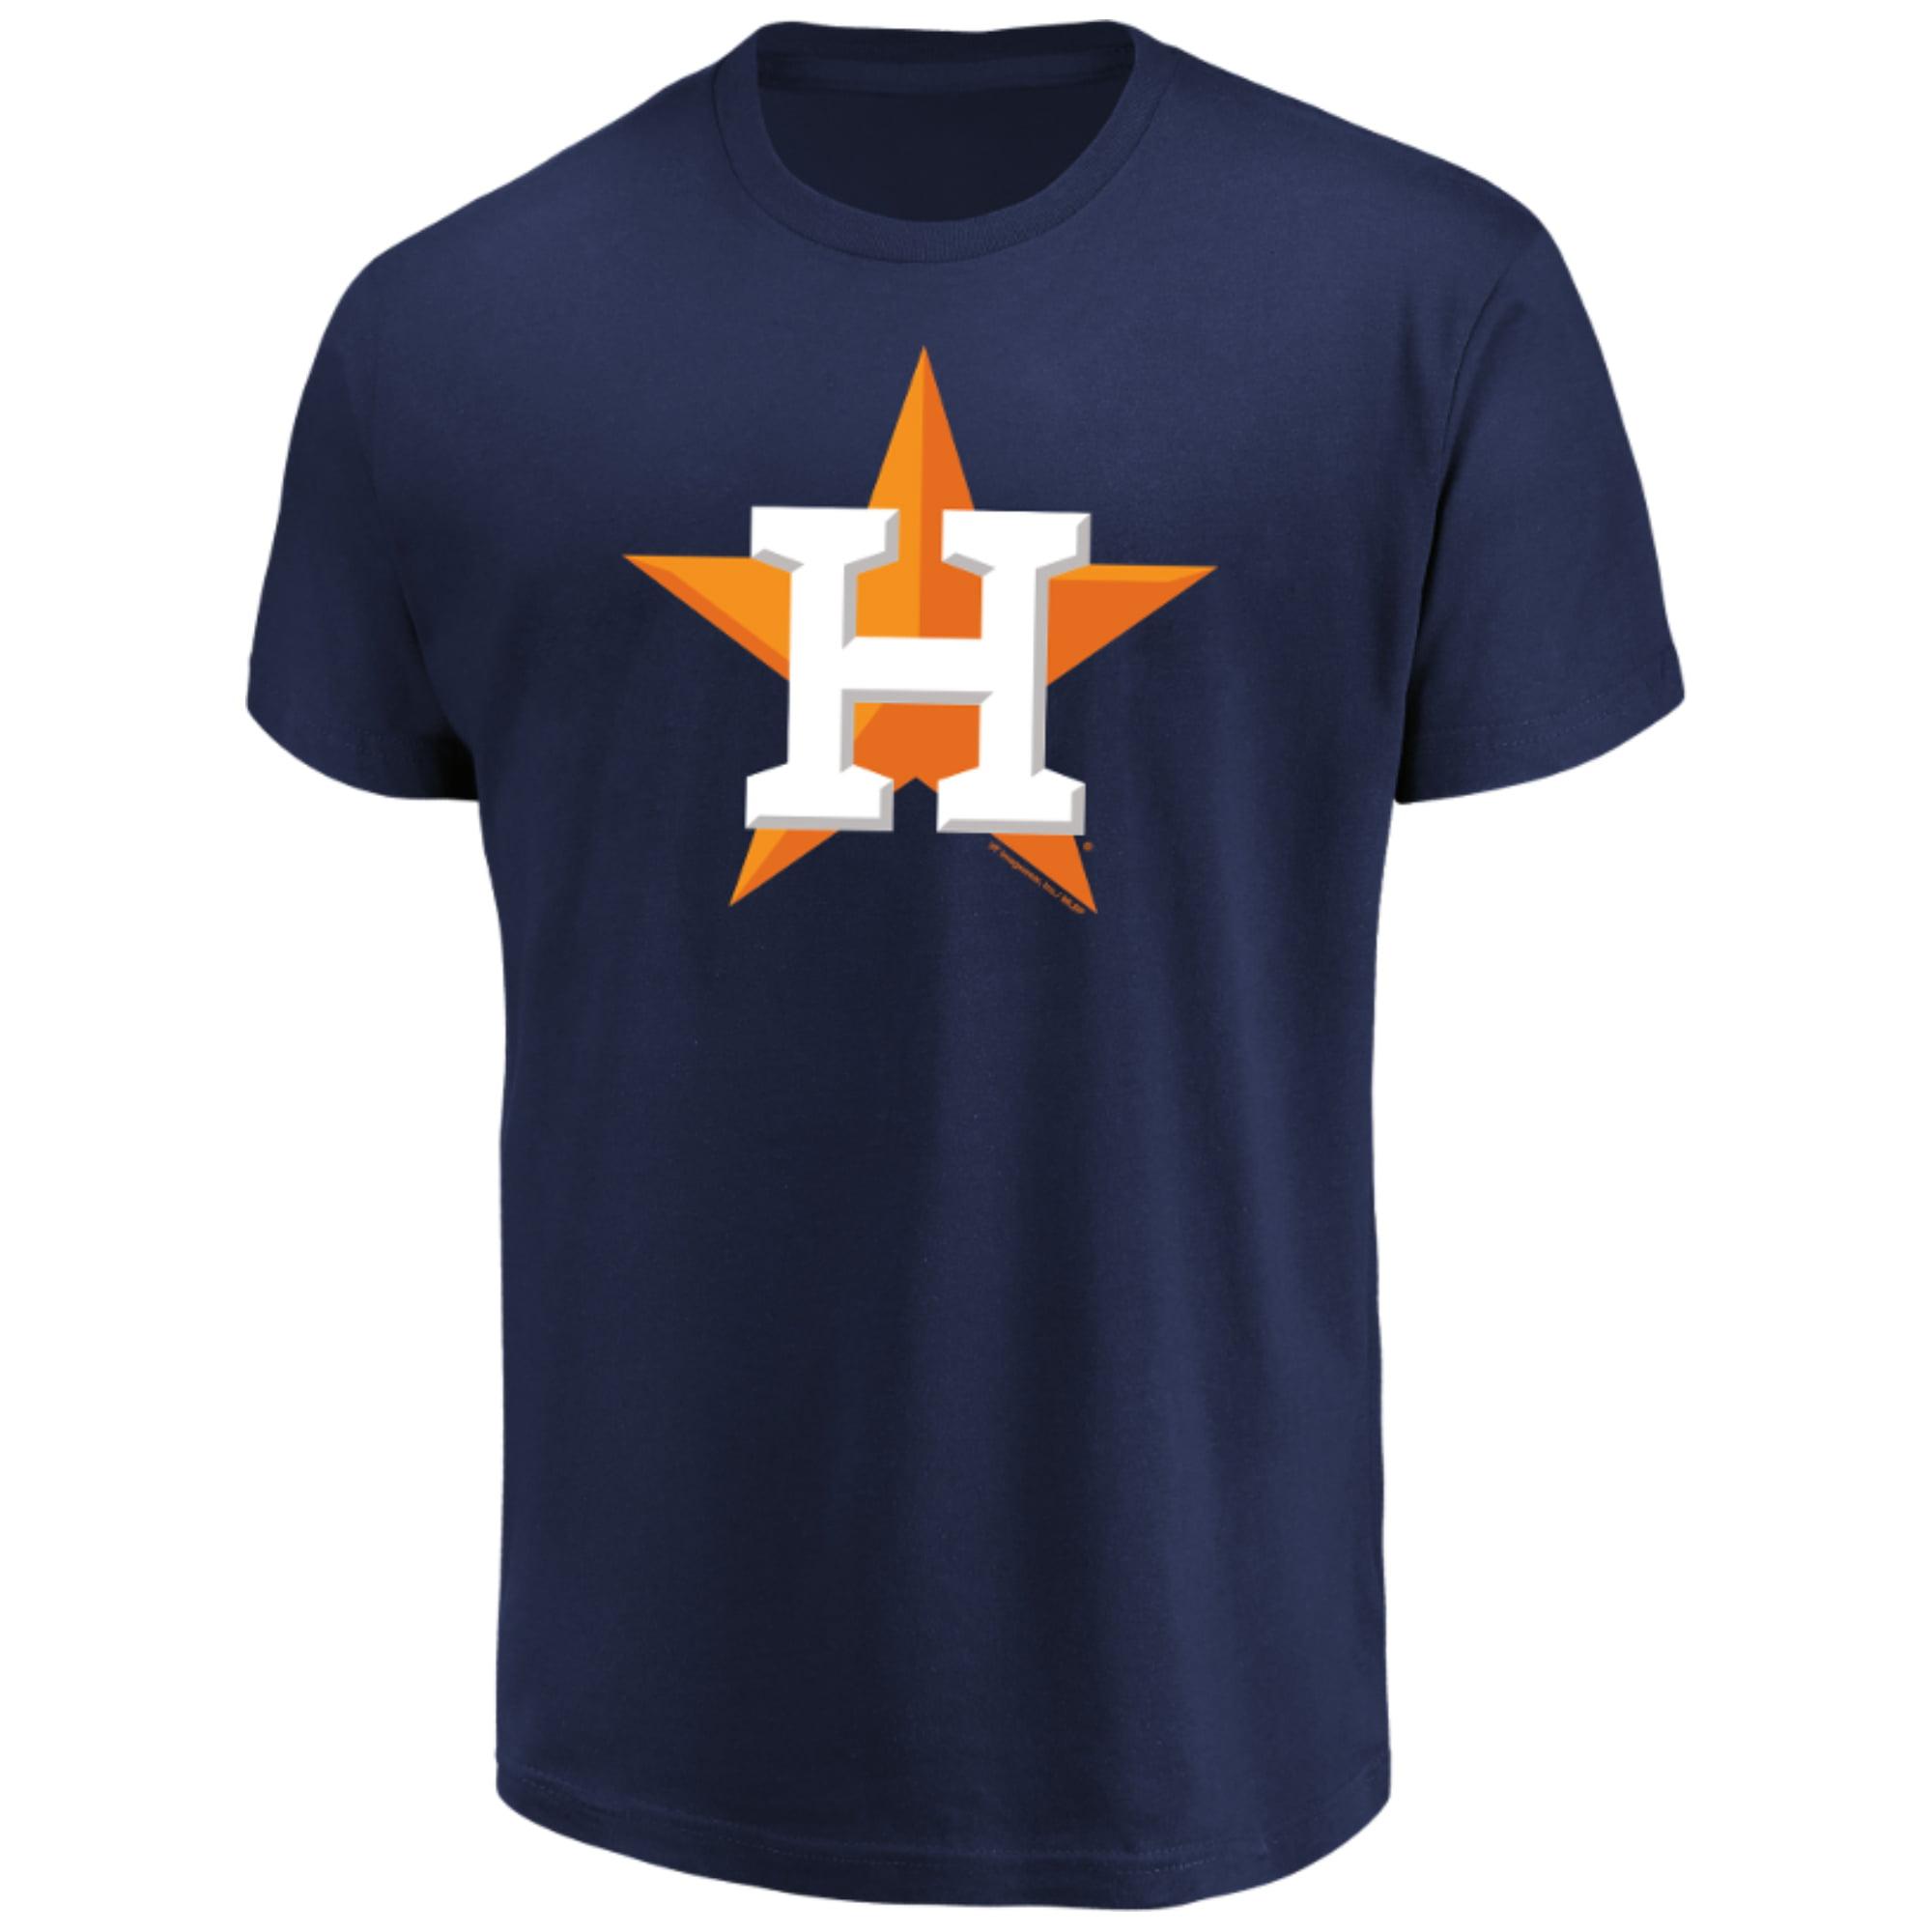 Men's Majestic Navy Houston Astros Top Ranking T-Shirt